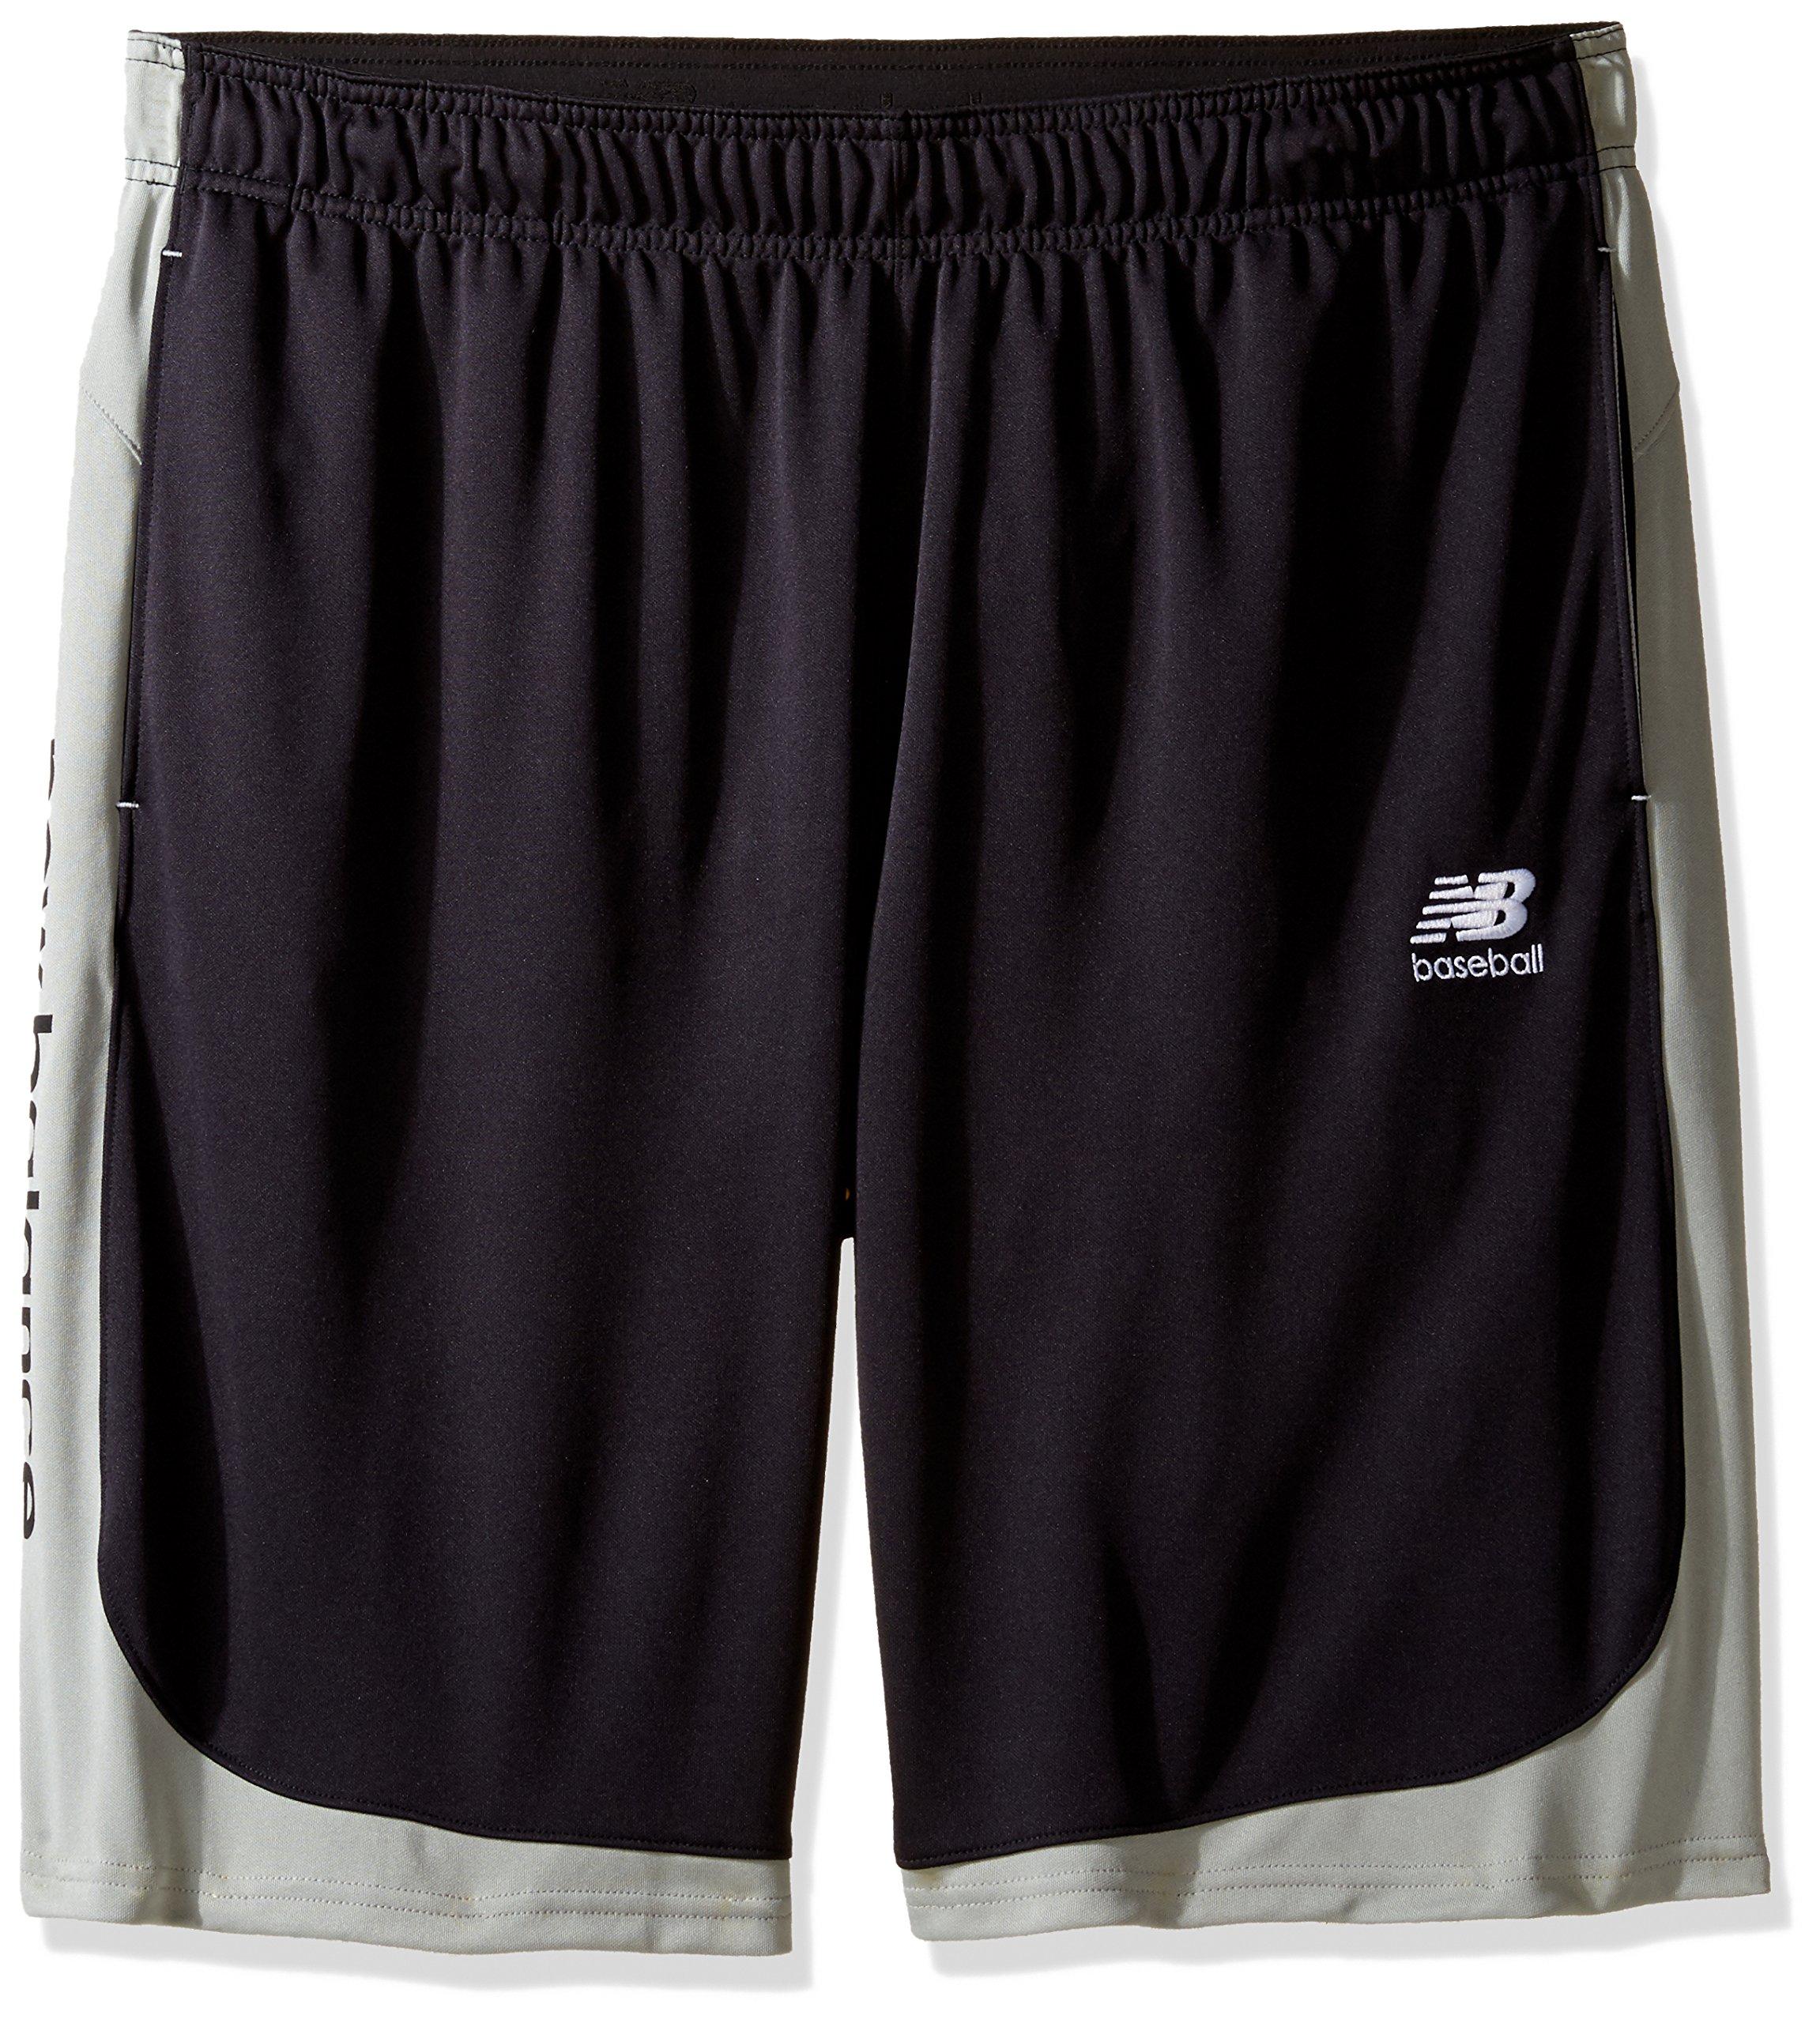 New Balance Men's Baseball Training Shorts, Black, Small by New Balance